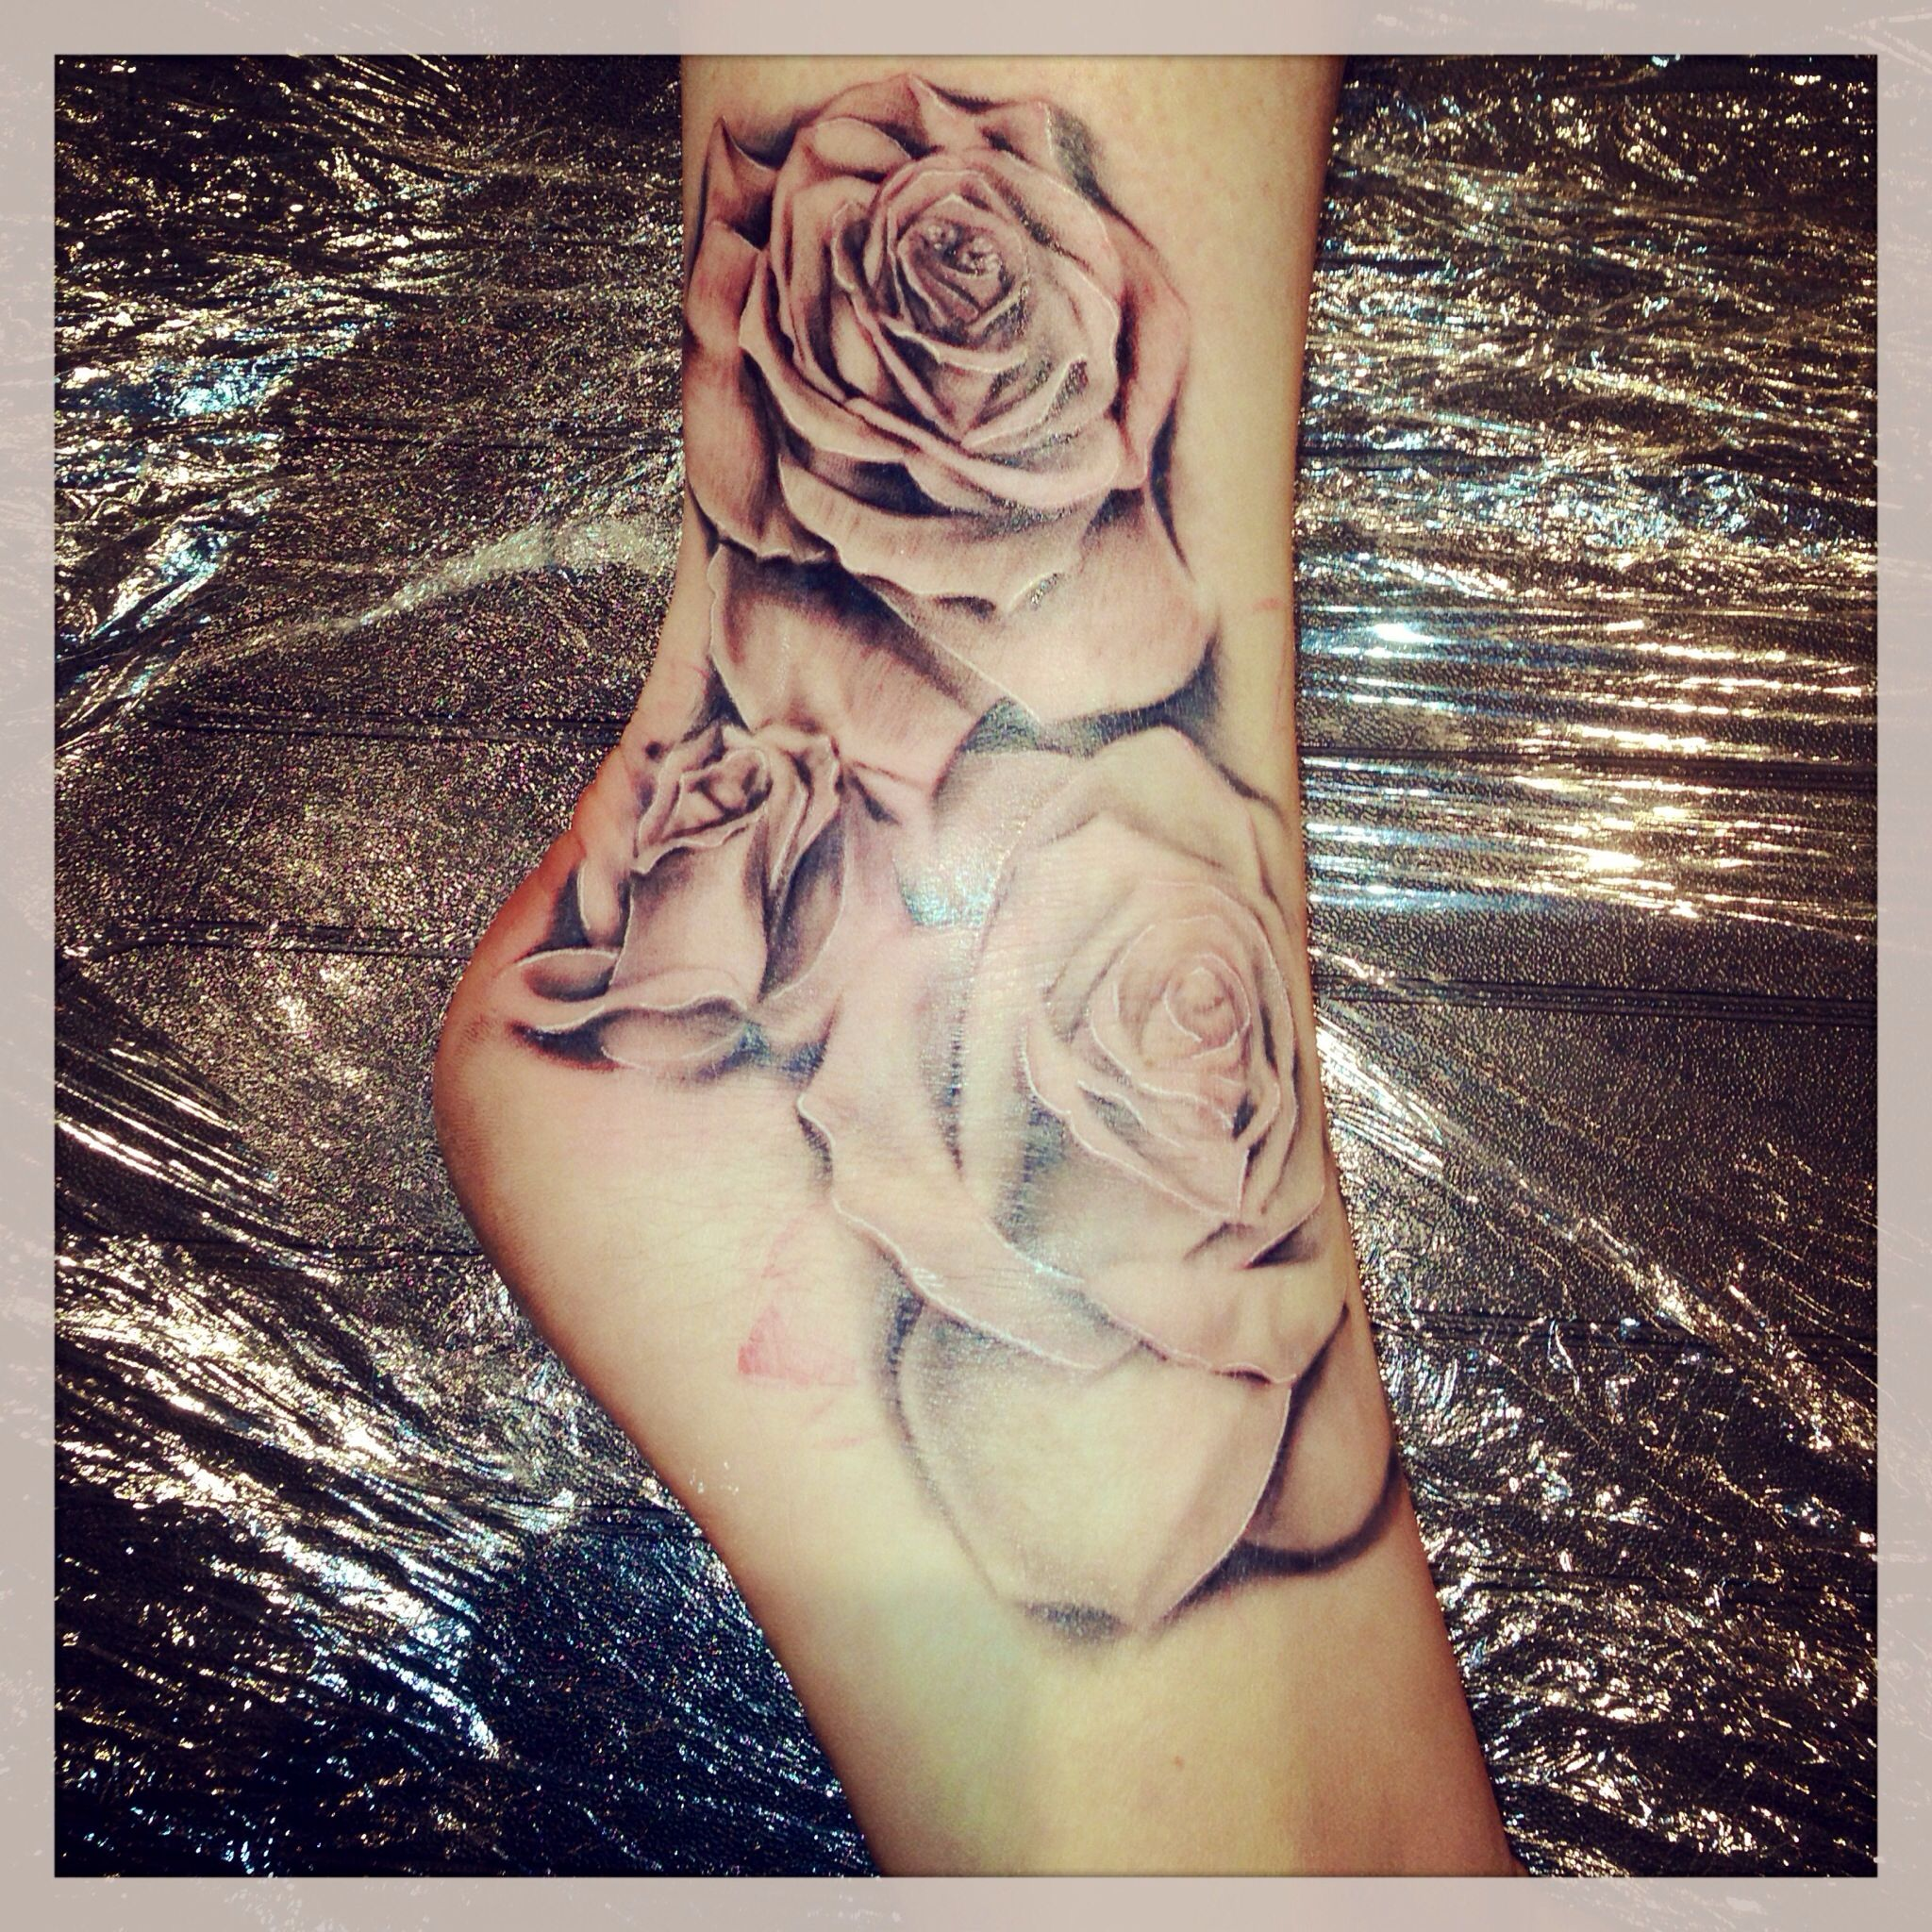 Good ankle tattoo ideas pin by phillip muradanes on tat stuff  pinterest  tattoo ankle